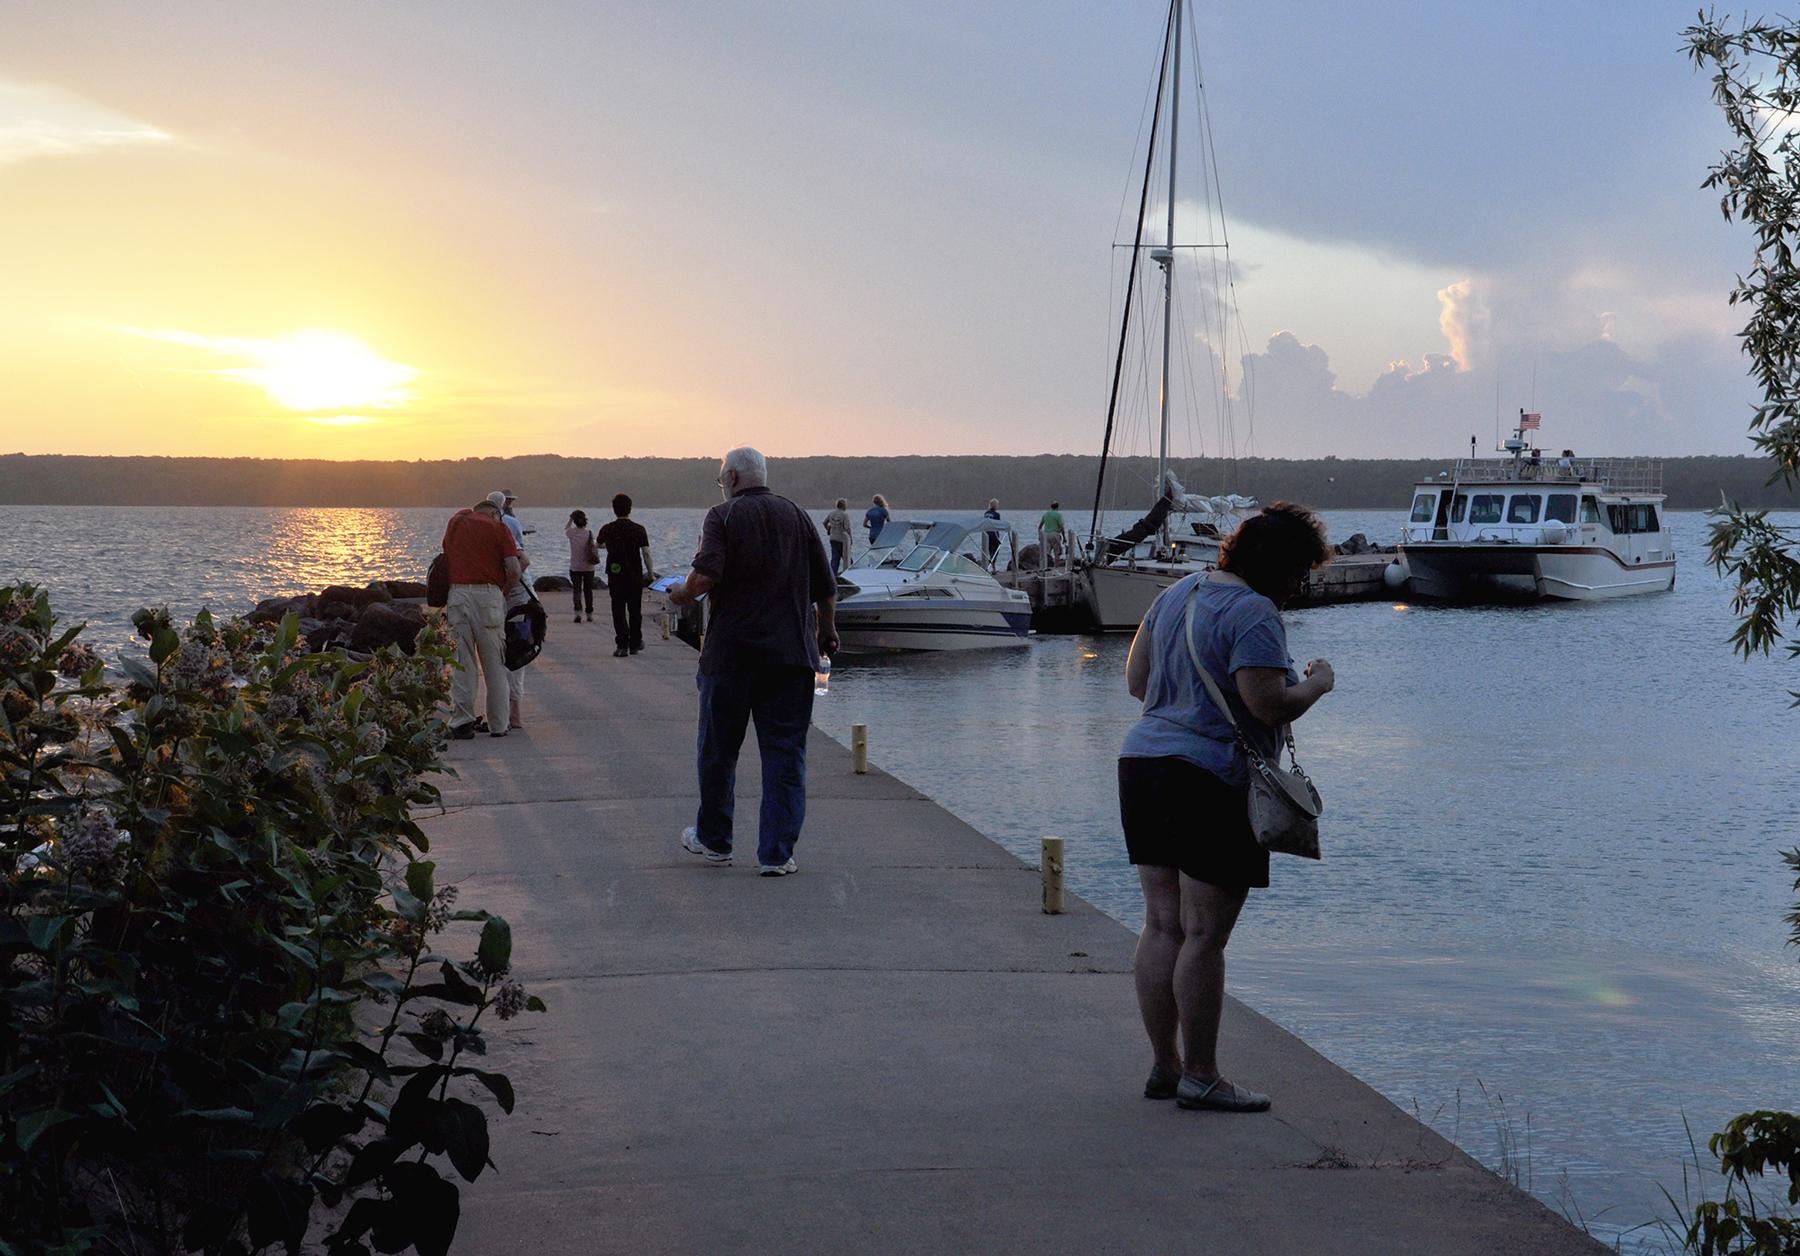 Visitors enjoy the sunset at Presque Isle